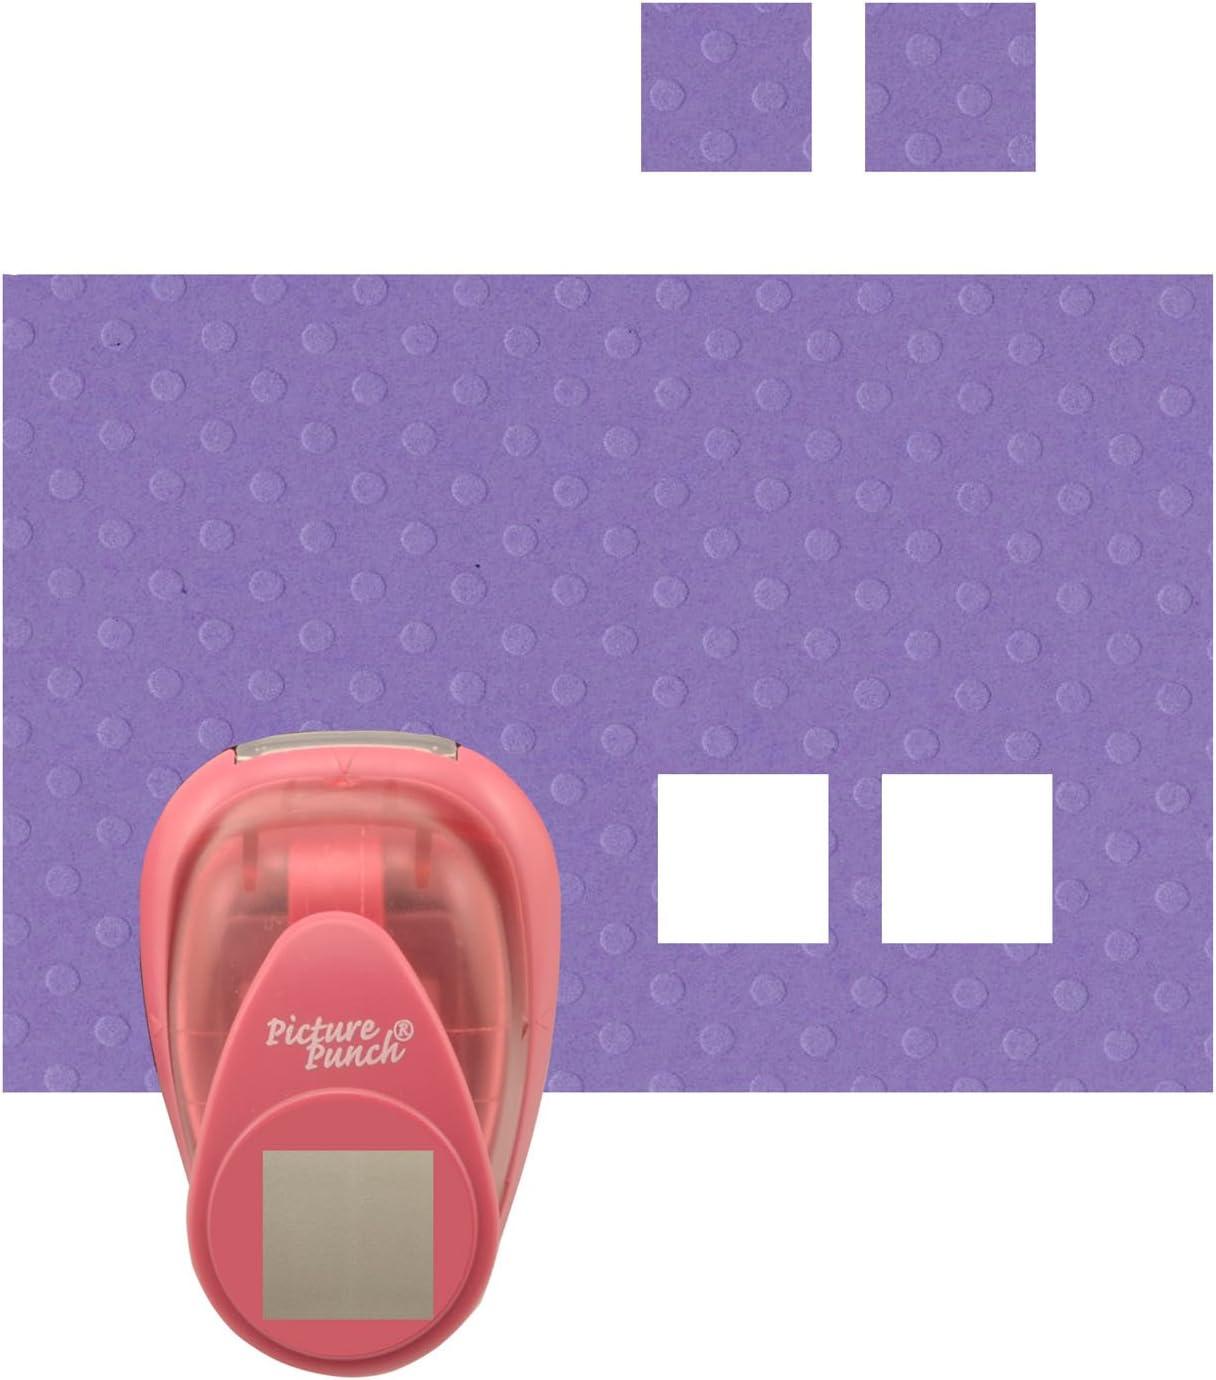 Grande Fustellatrice per Carta Vaessen Creative Perforatrice Quadrata L Maxi per DIY Scrapbooking e Creazione di Biglietti